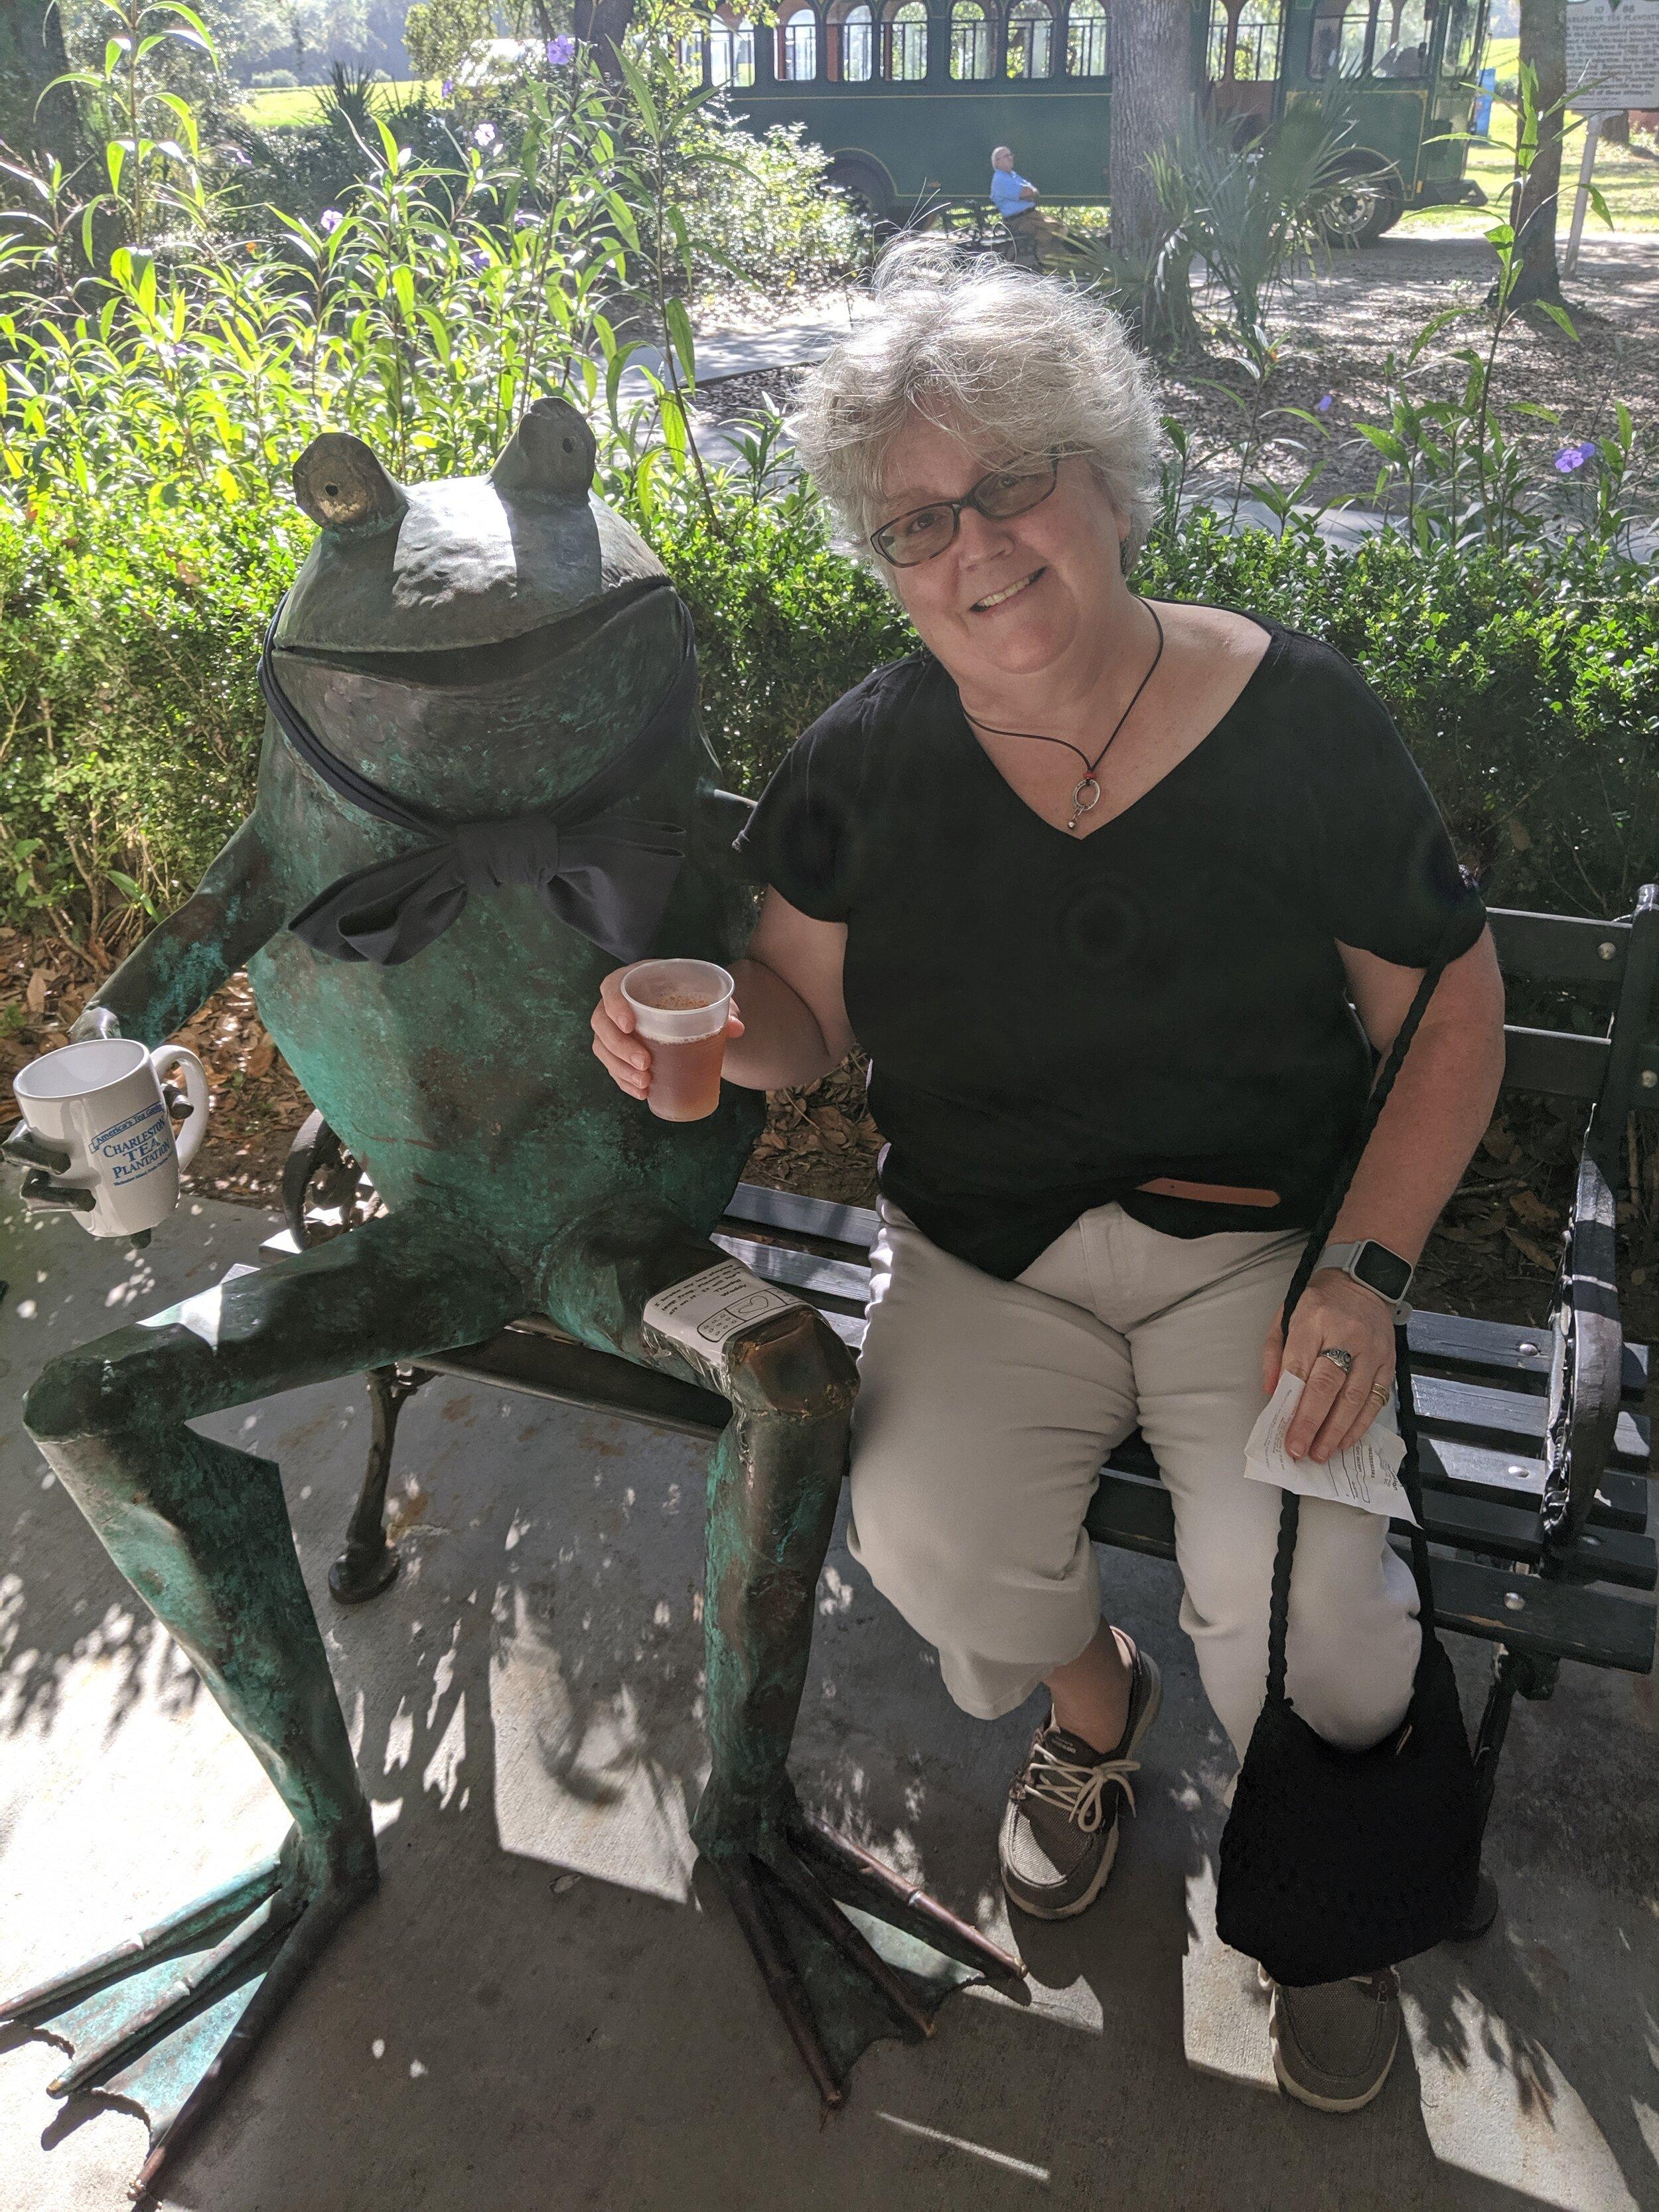 Hey, Mindy found a friend for tea!